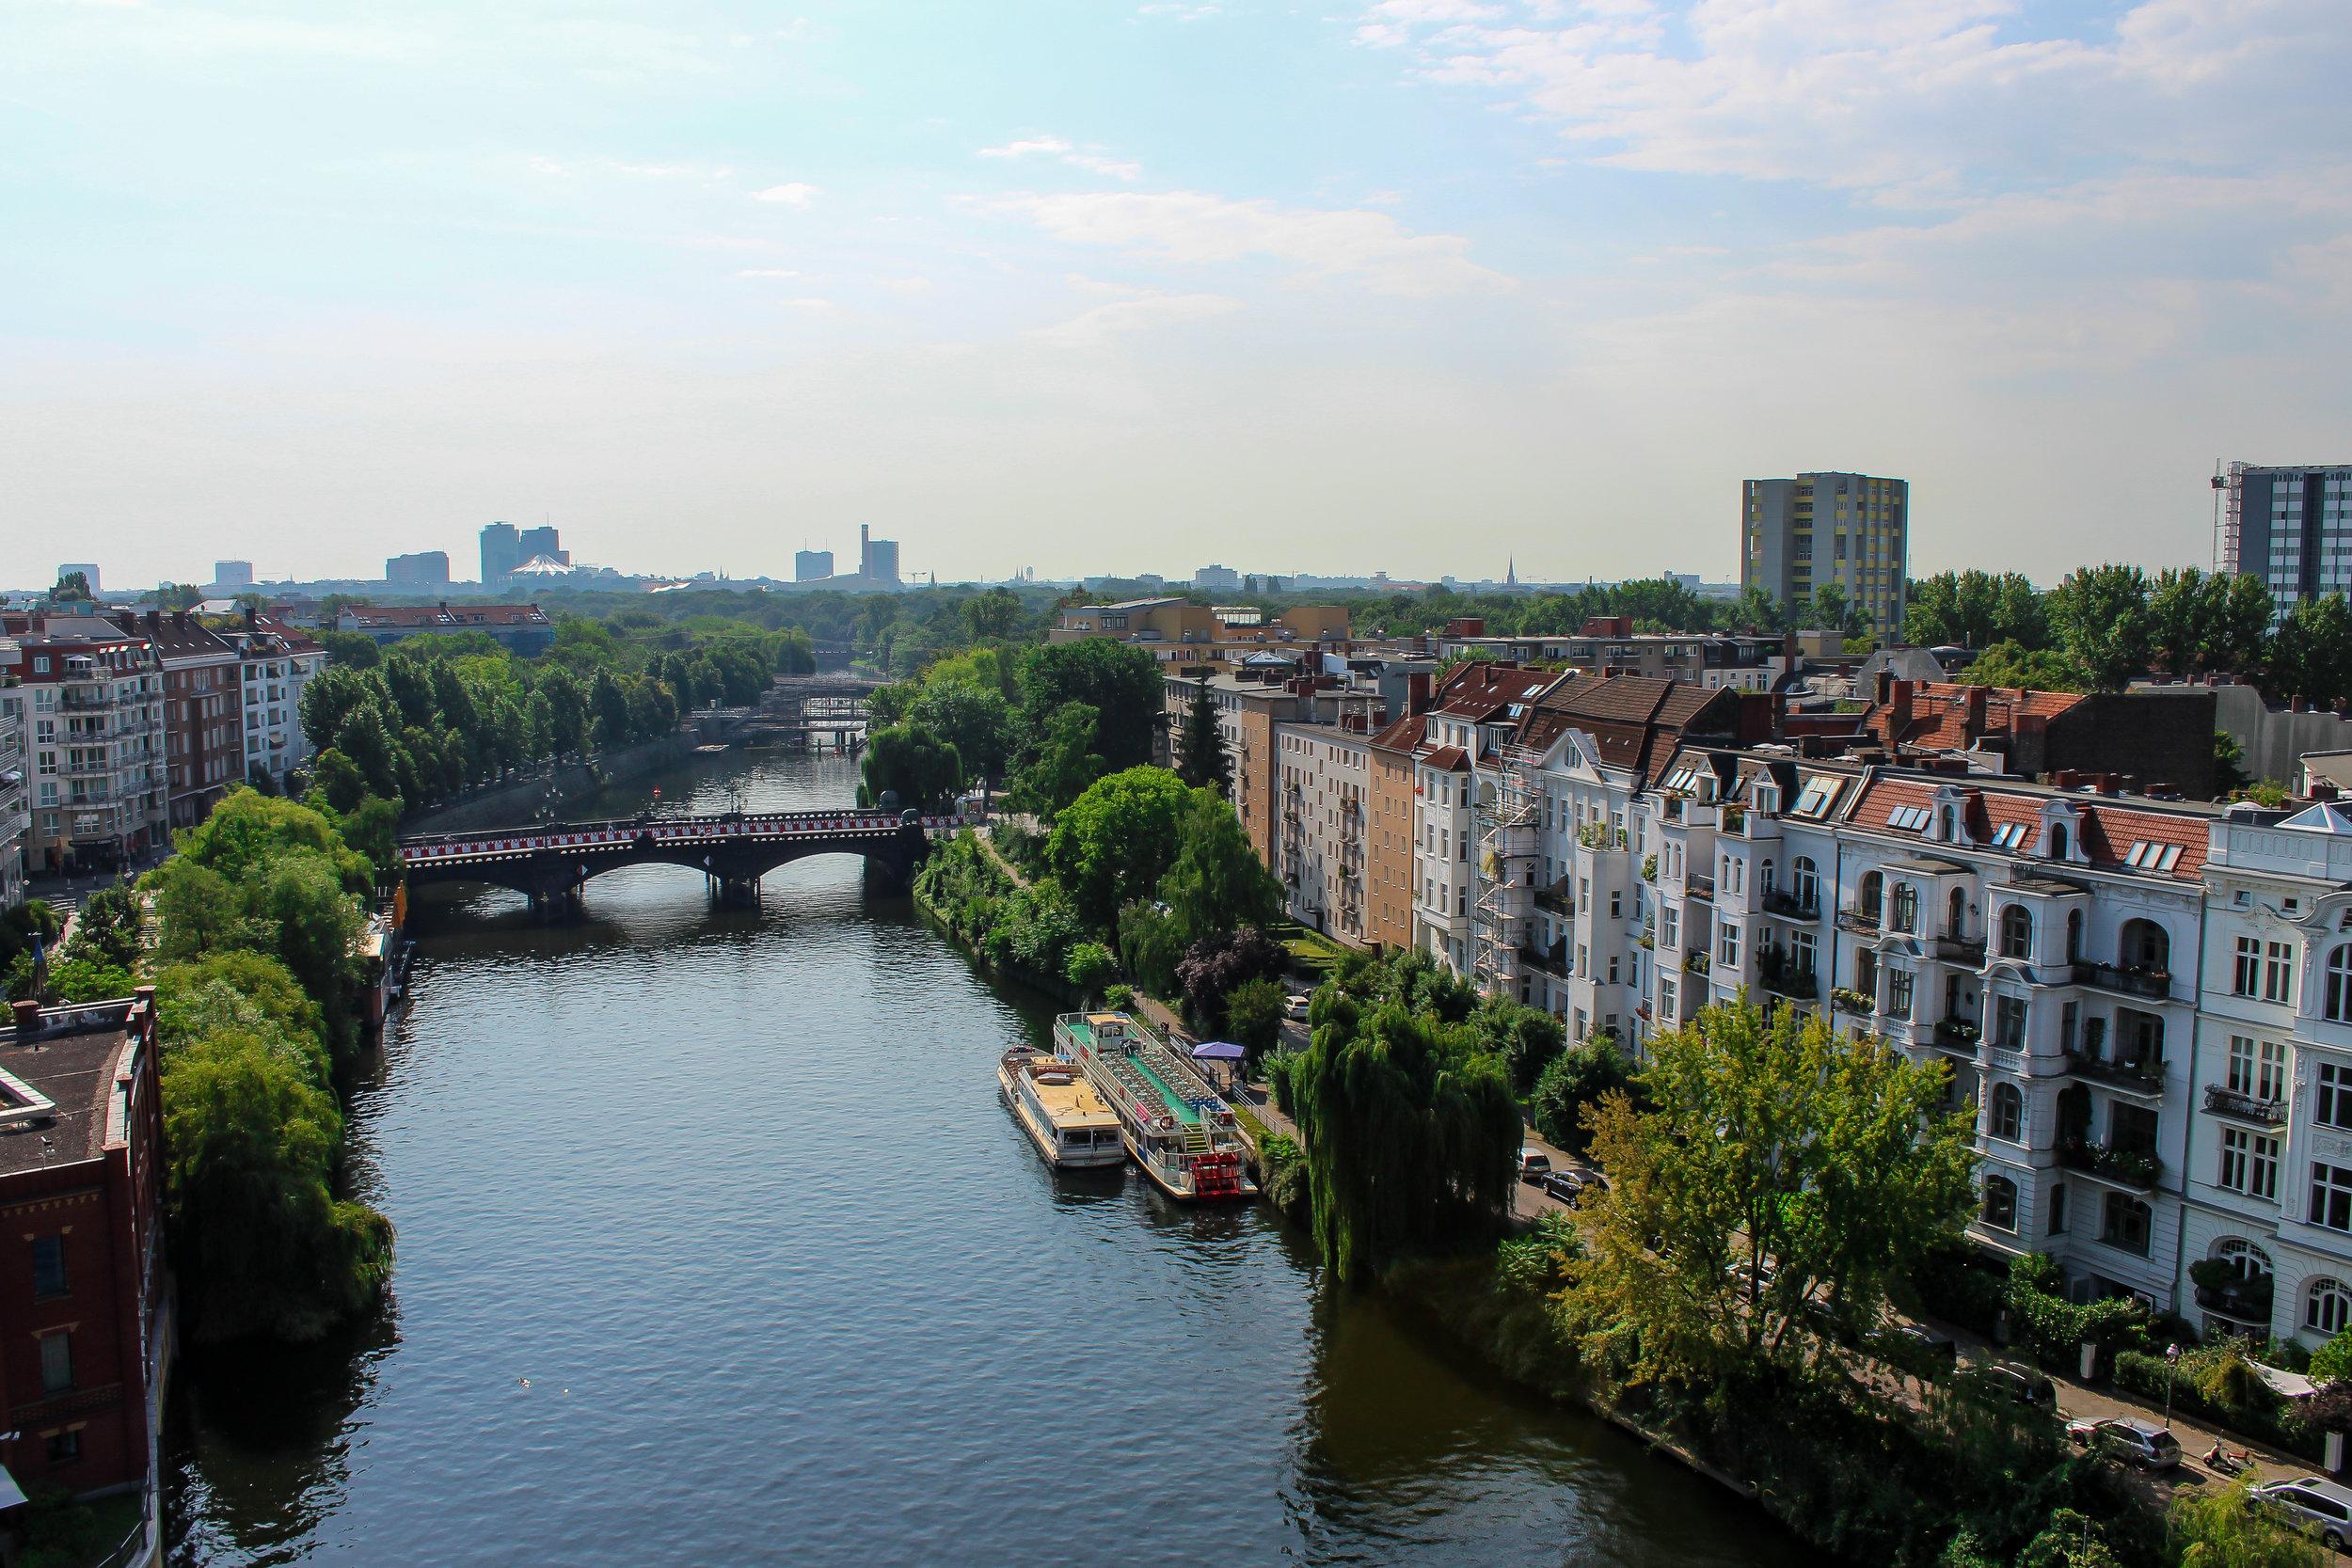 Germany - Munich & BerlinAugust 2015